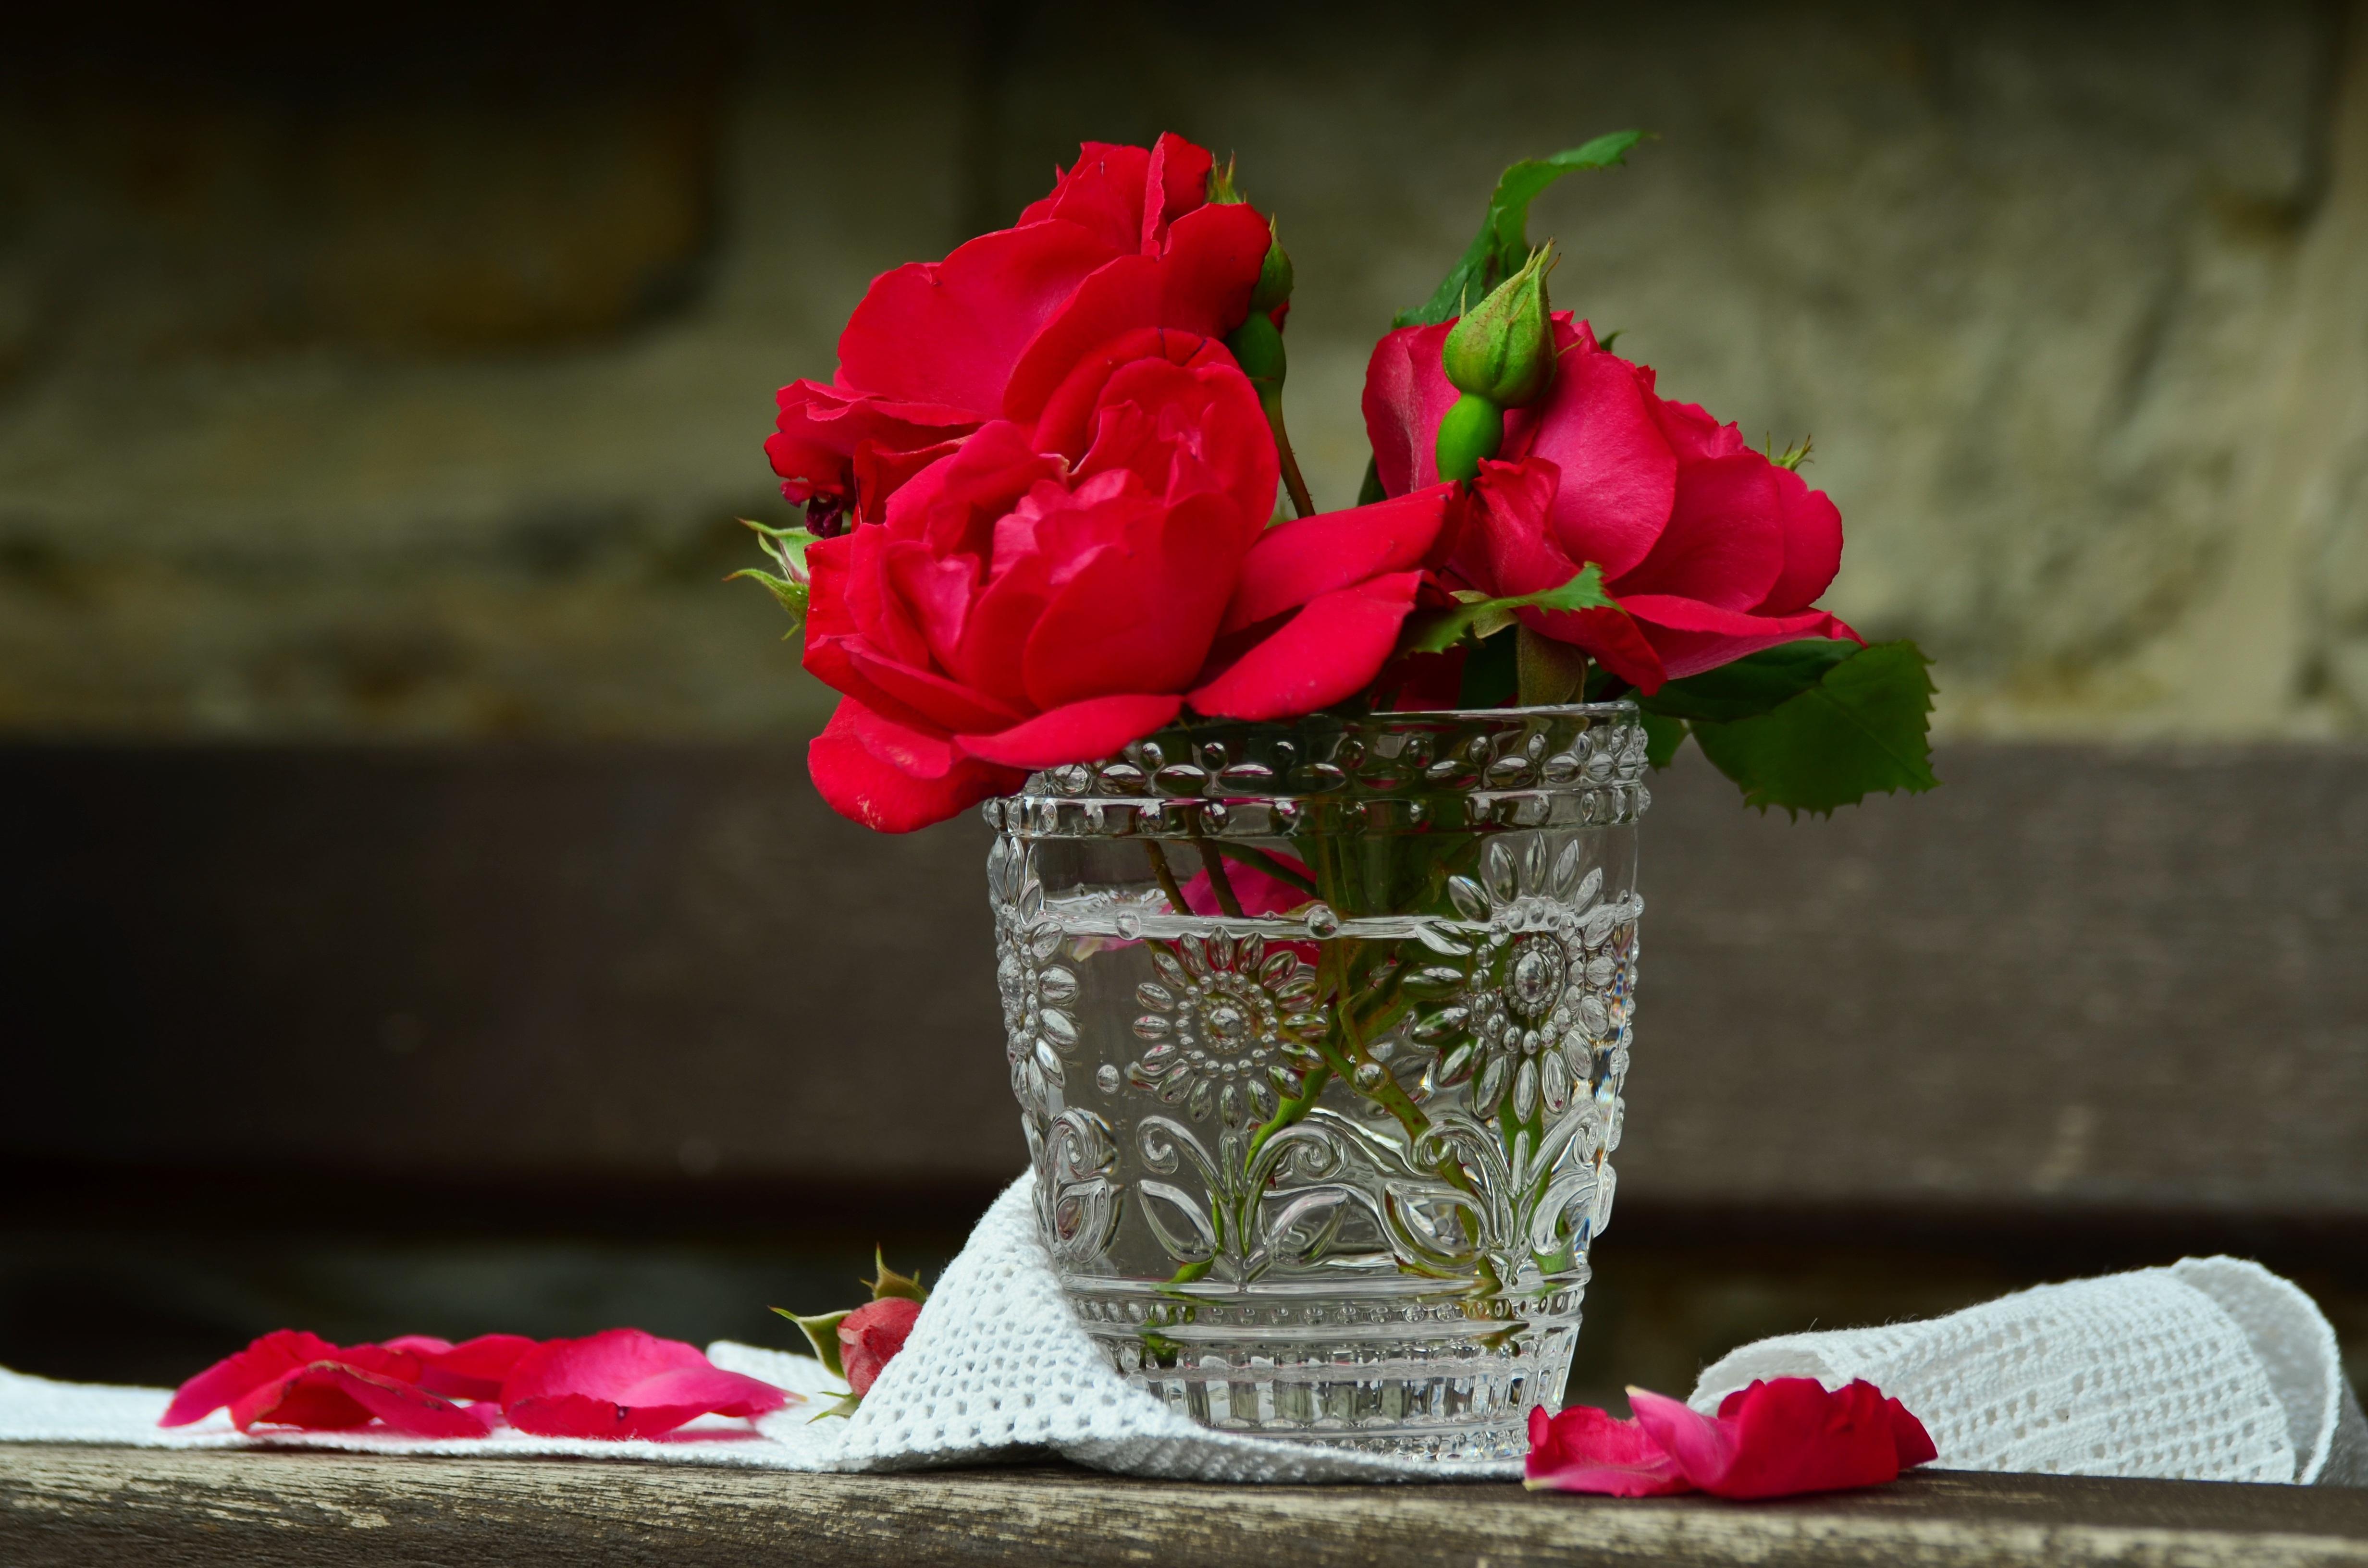 Free Images Blossom Petal Glass Love Romantic Pink Close